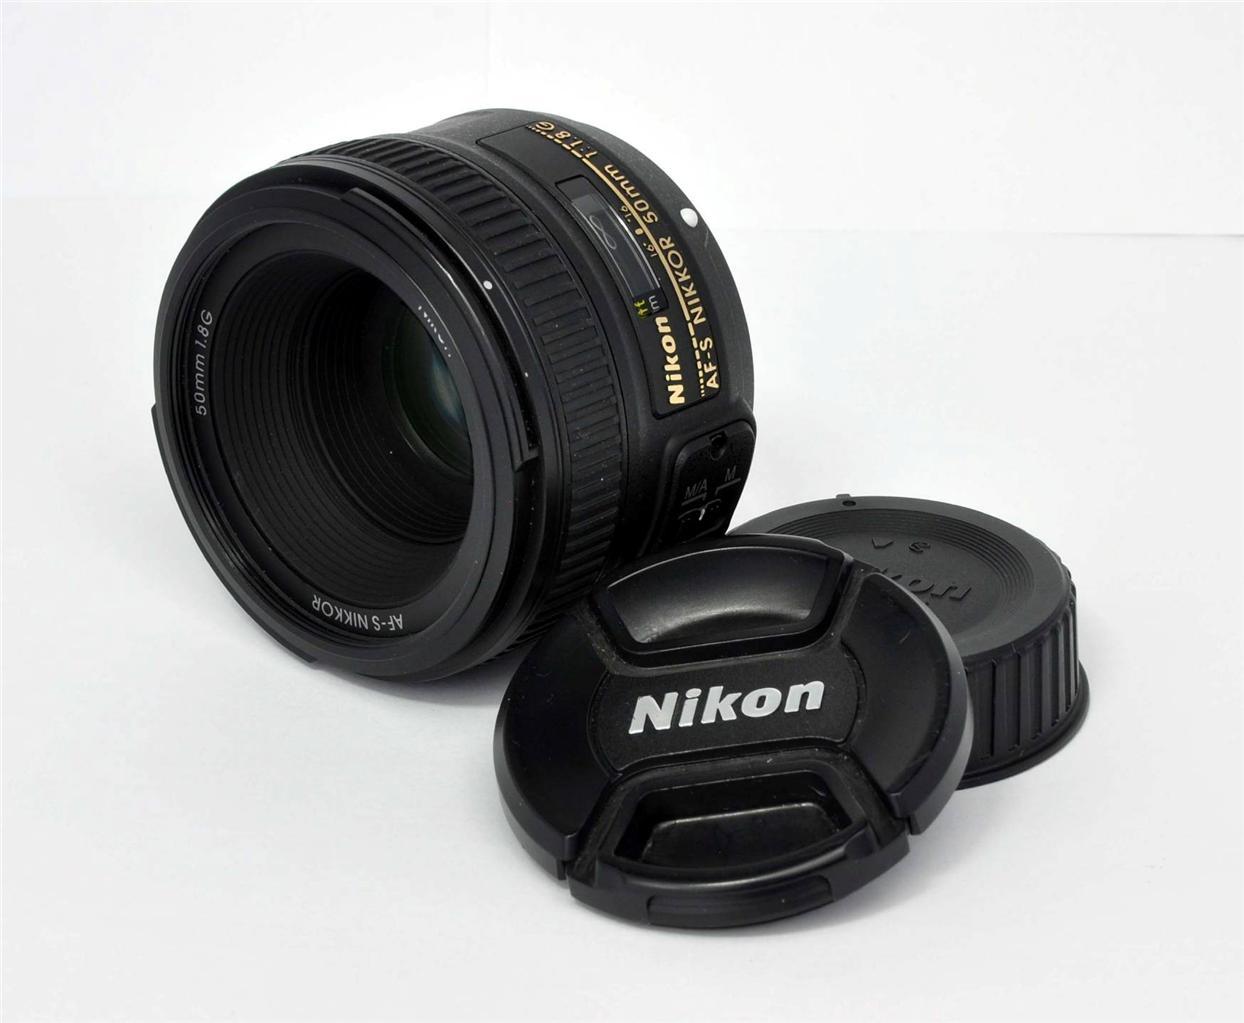 Nikon AF 50mm f/1.8 D : Caratteristiche e Opinioni | JuzaPhoto